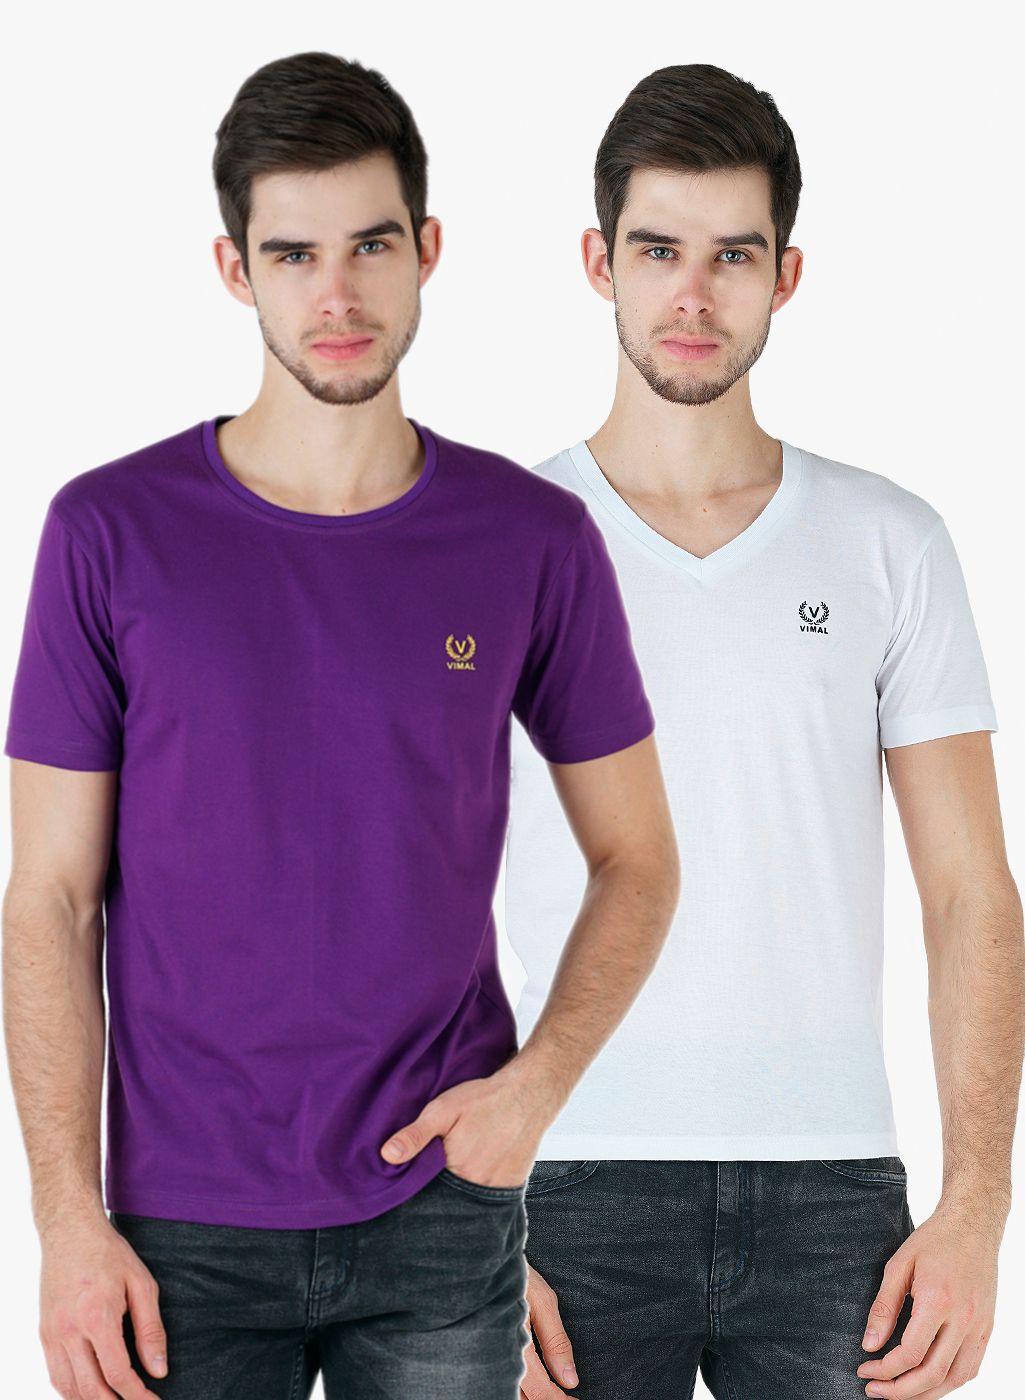 Vimal Multi Round T-Shirt Pack of 2